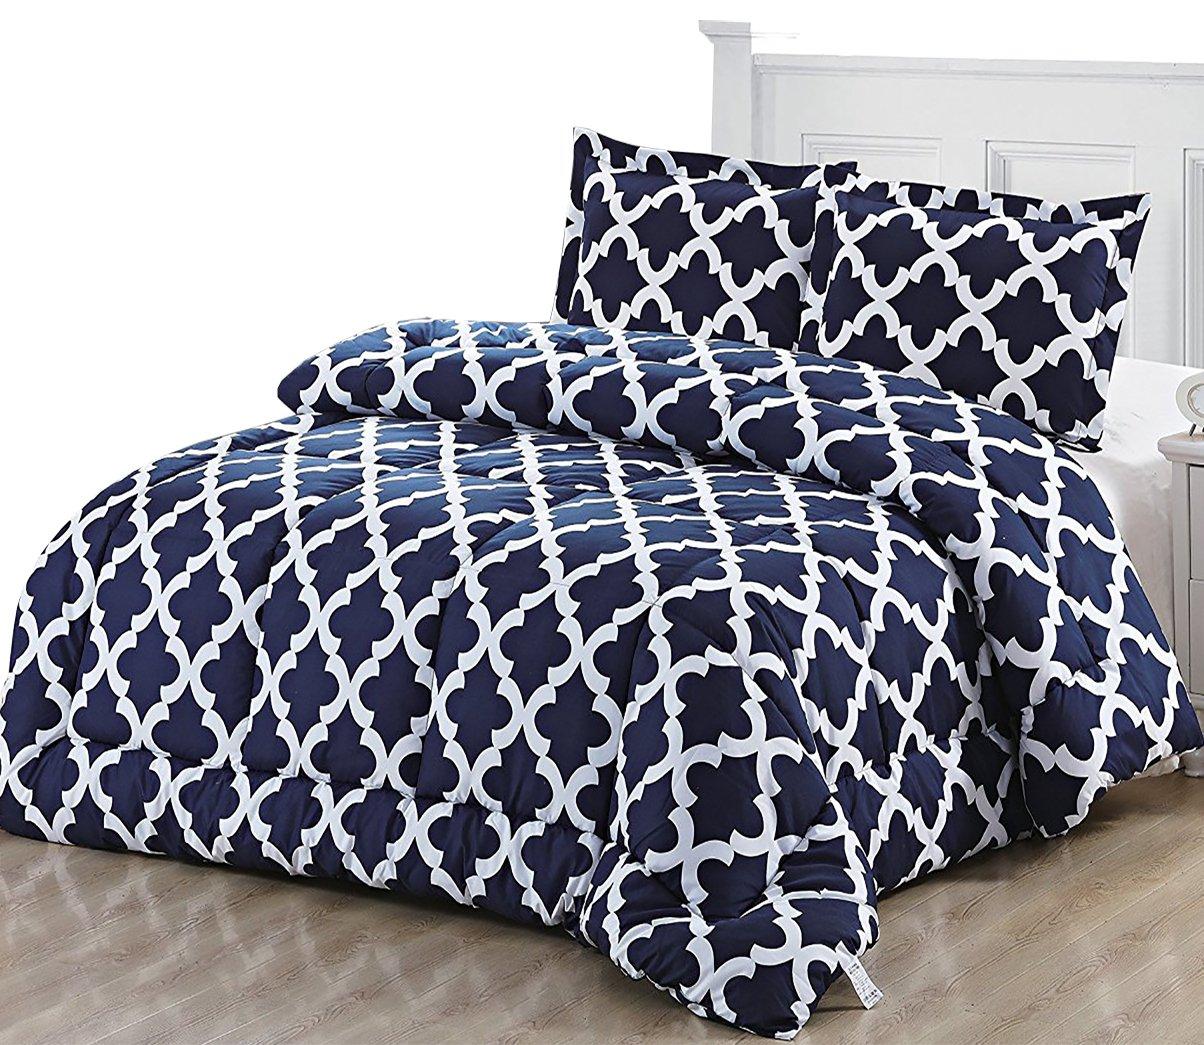 Utopia Bedding Printed Twin Goose Down Alternative Comforter Set